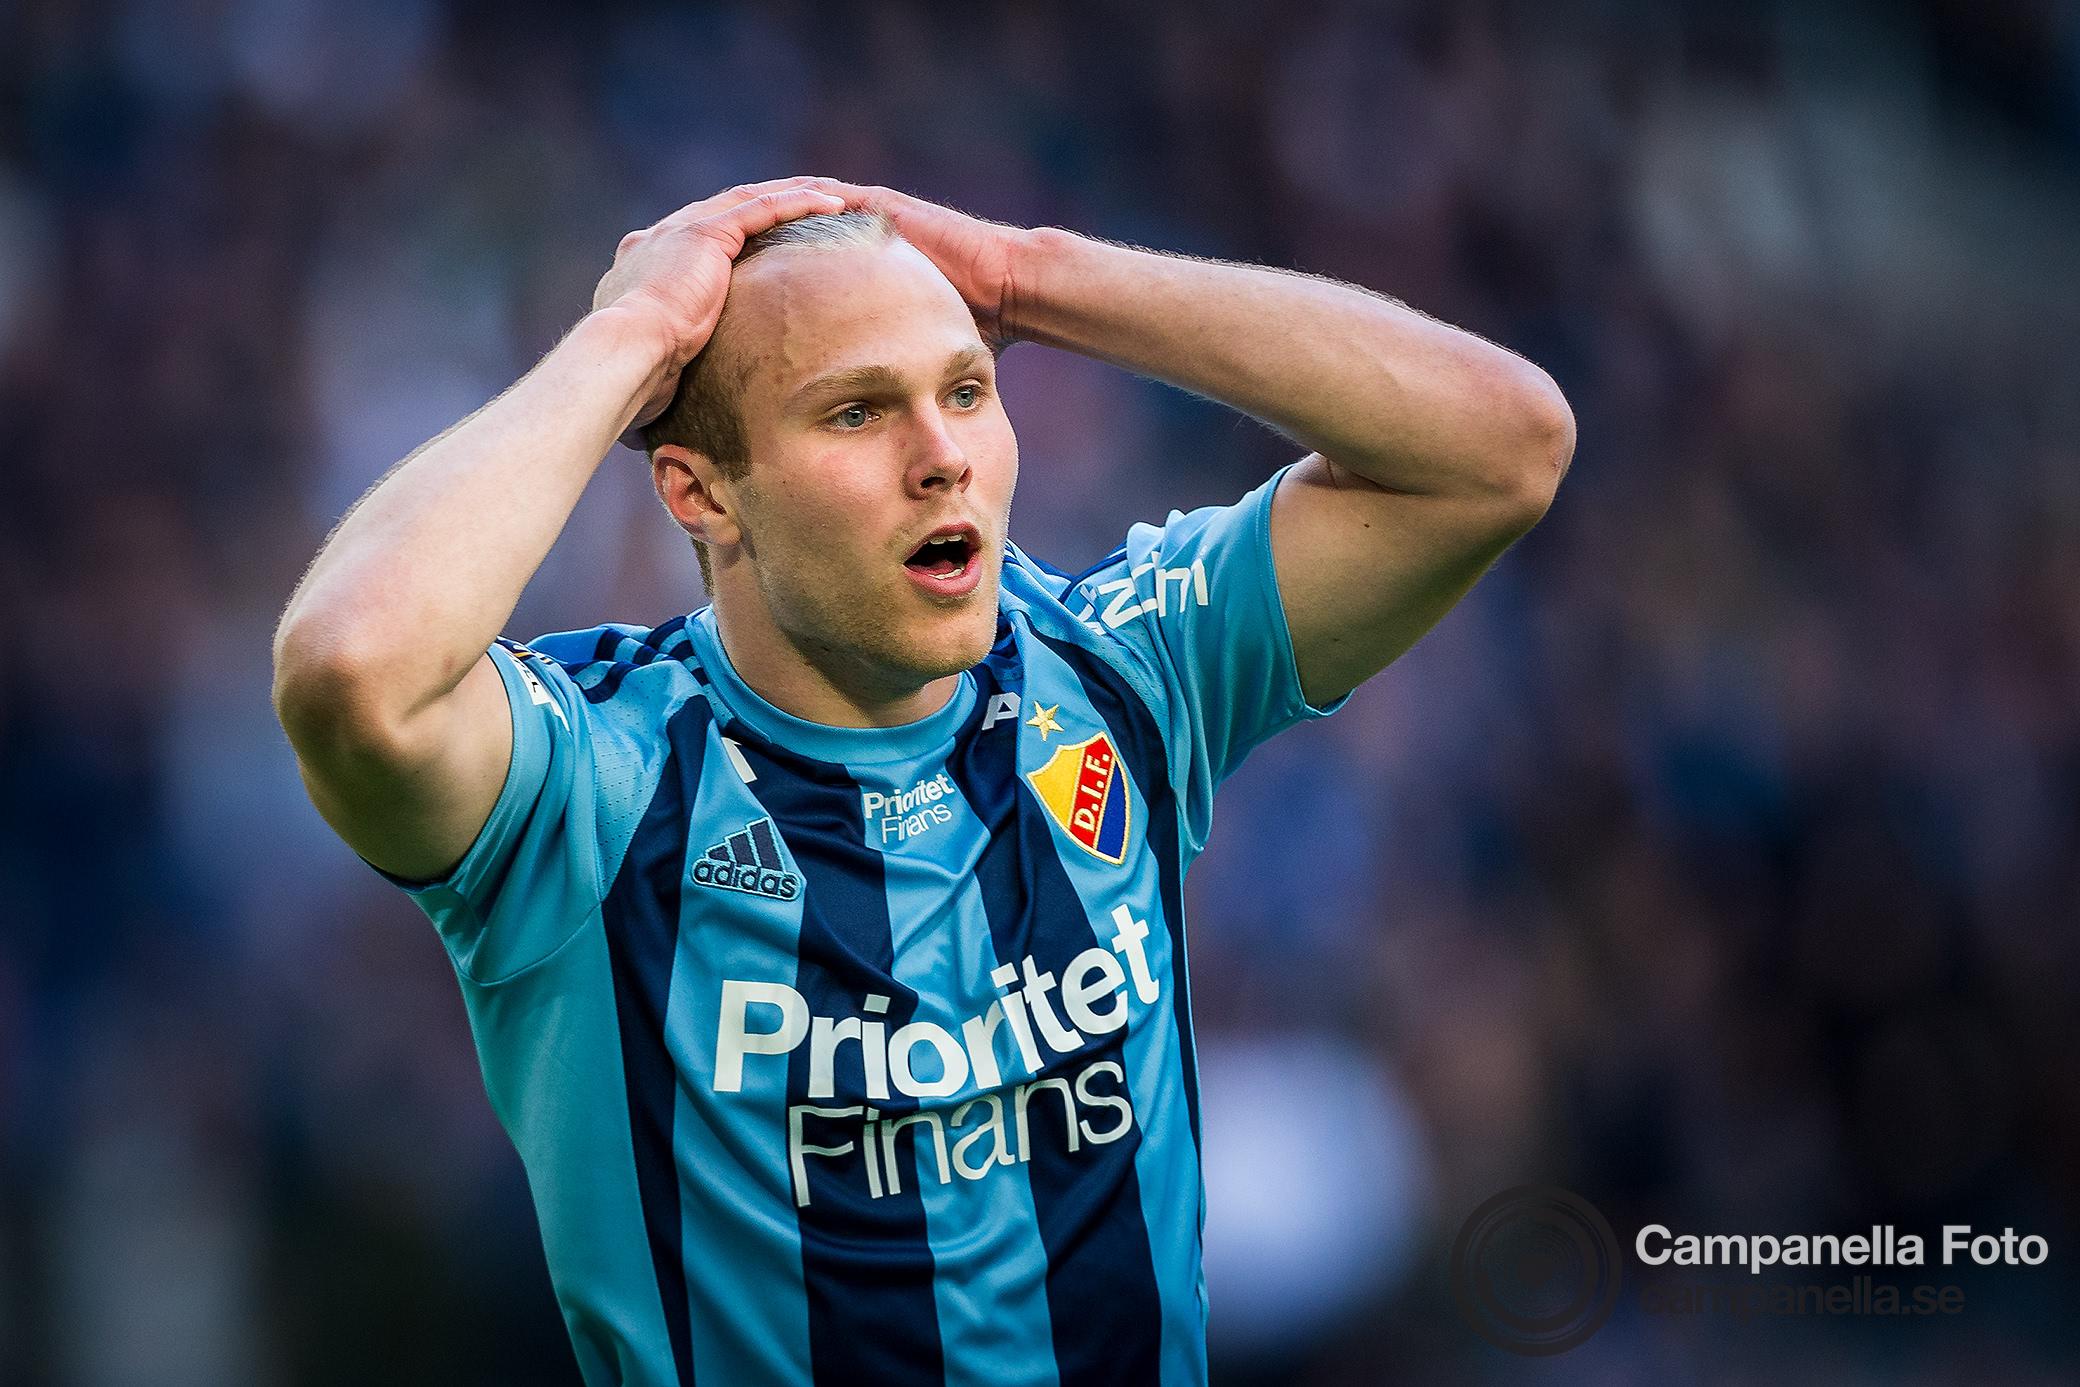 3-3 draw between Djurgården & Norrköping - Michael Campanella Photography